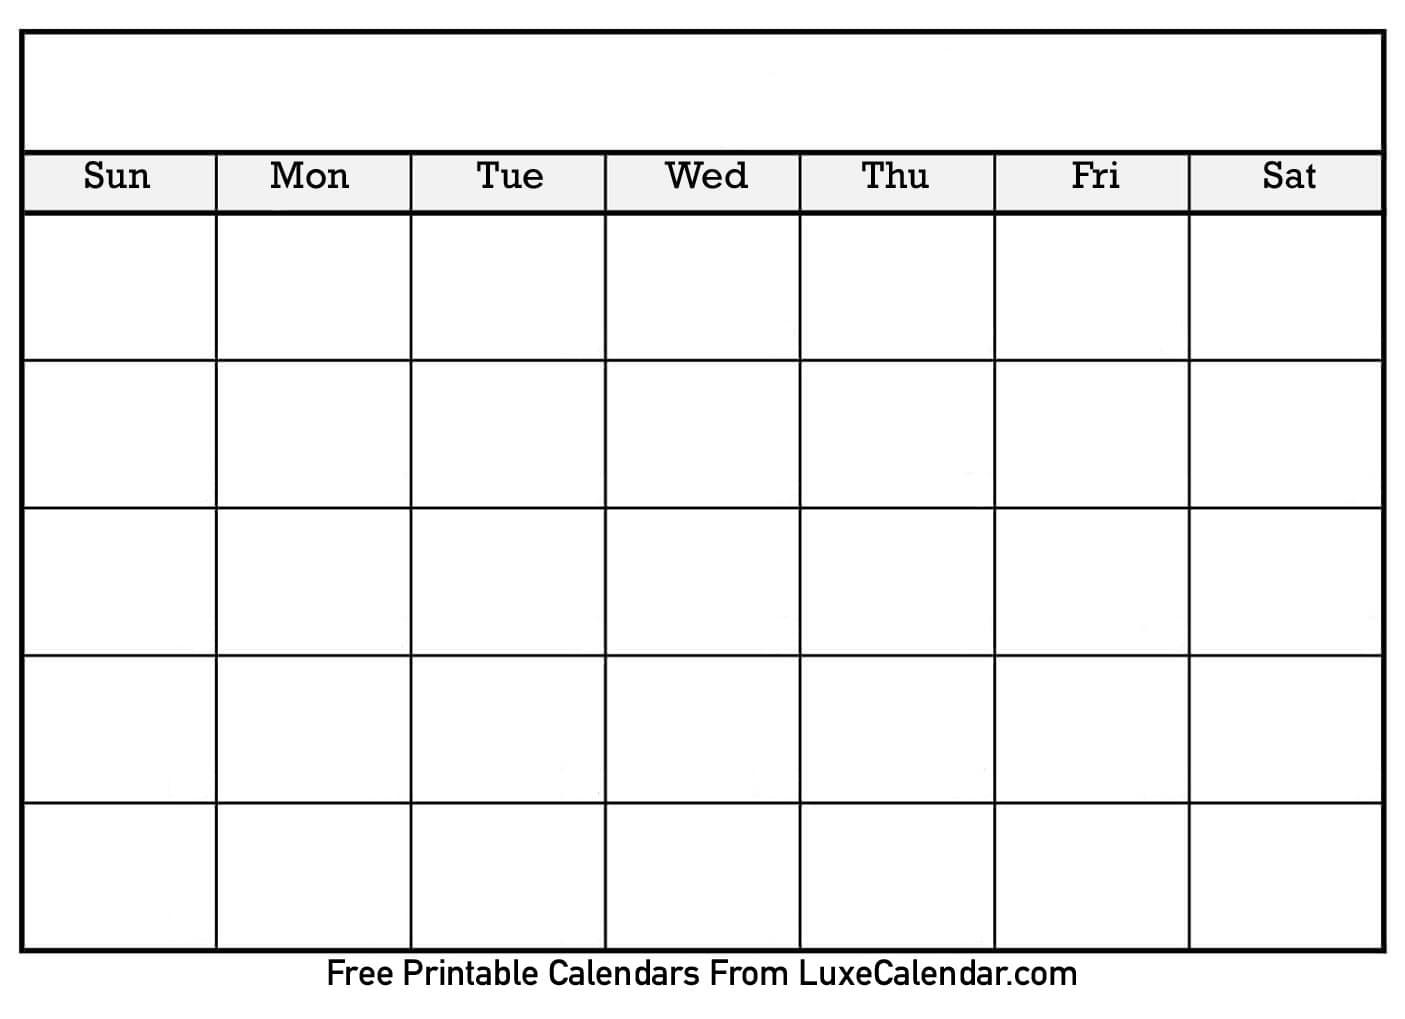 Blank Printable Calendar - Luxe Calendar pertaining to Blank Monthly Calendar Print Out